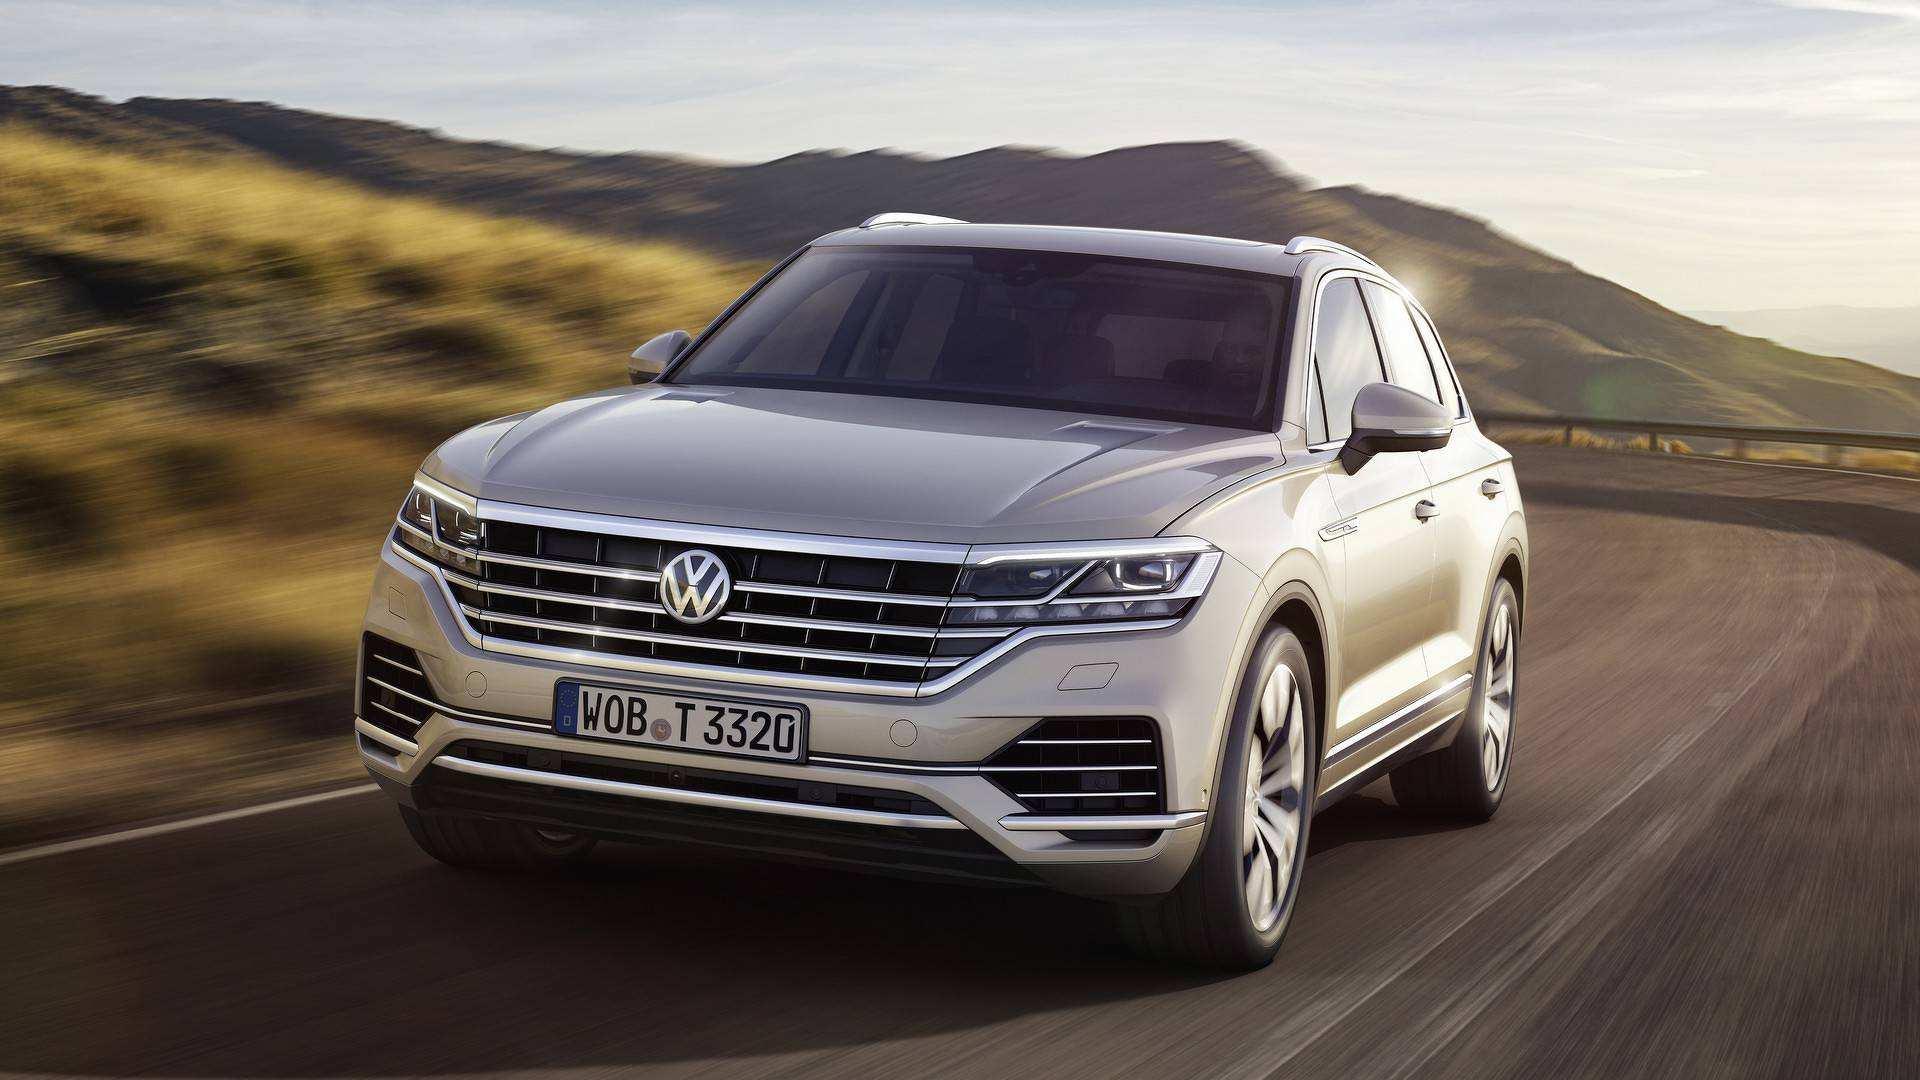 48 New VW Touareg 2020 New Concept Performance for VW Touareg 2020 New Concept